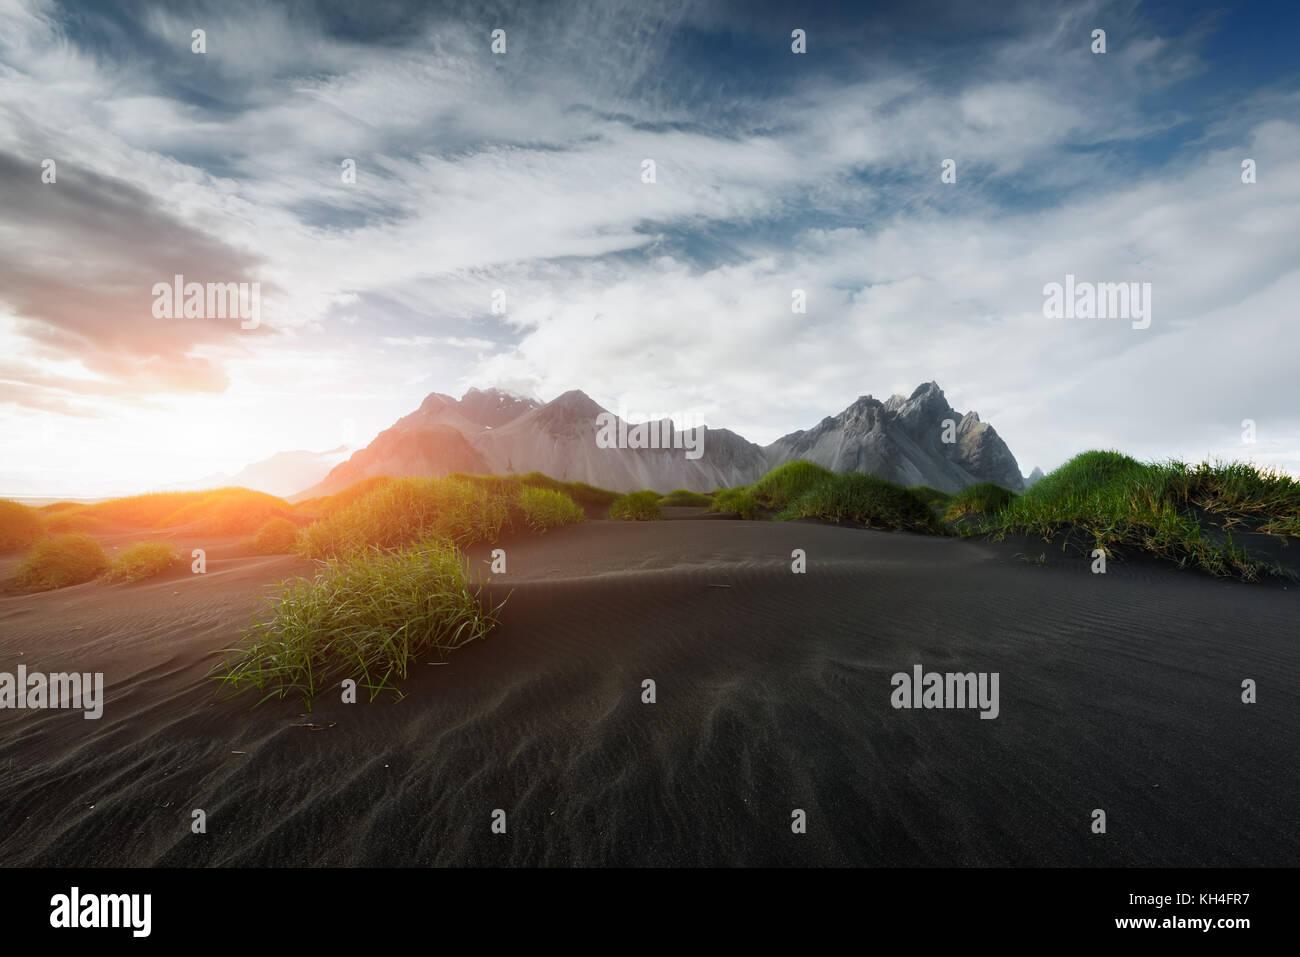 Stokksnes mountains and black desert - Stock Image